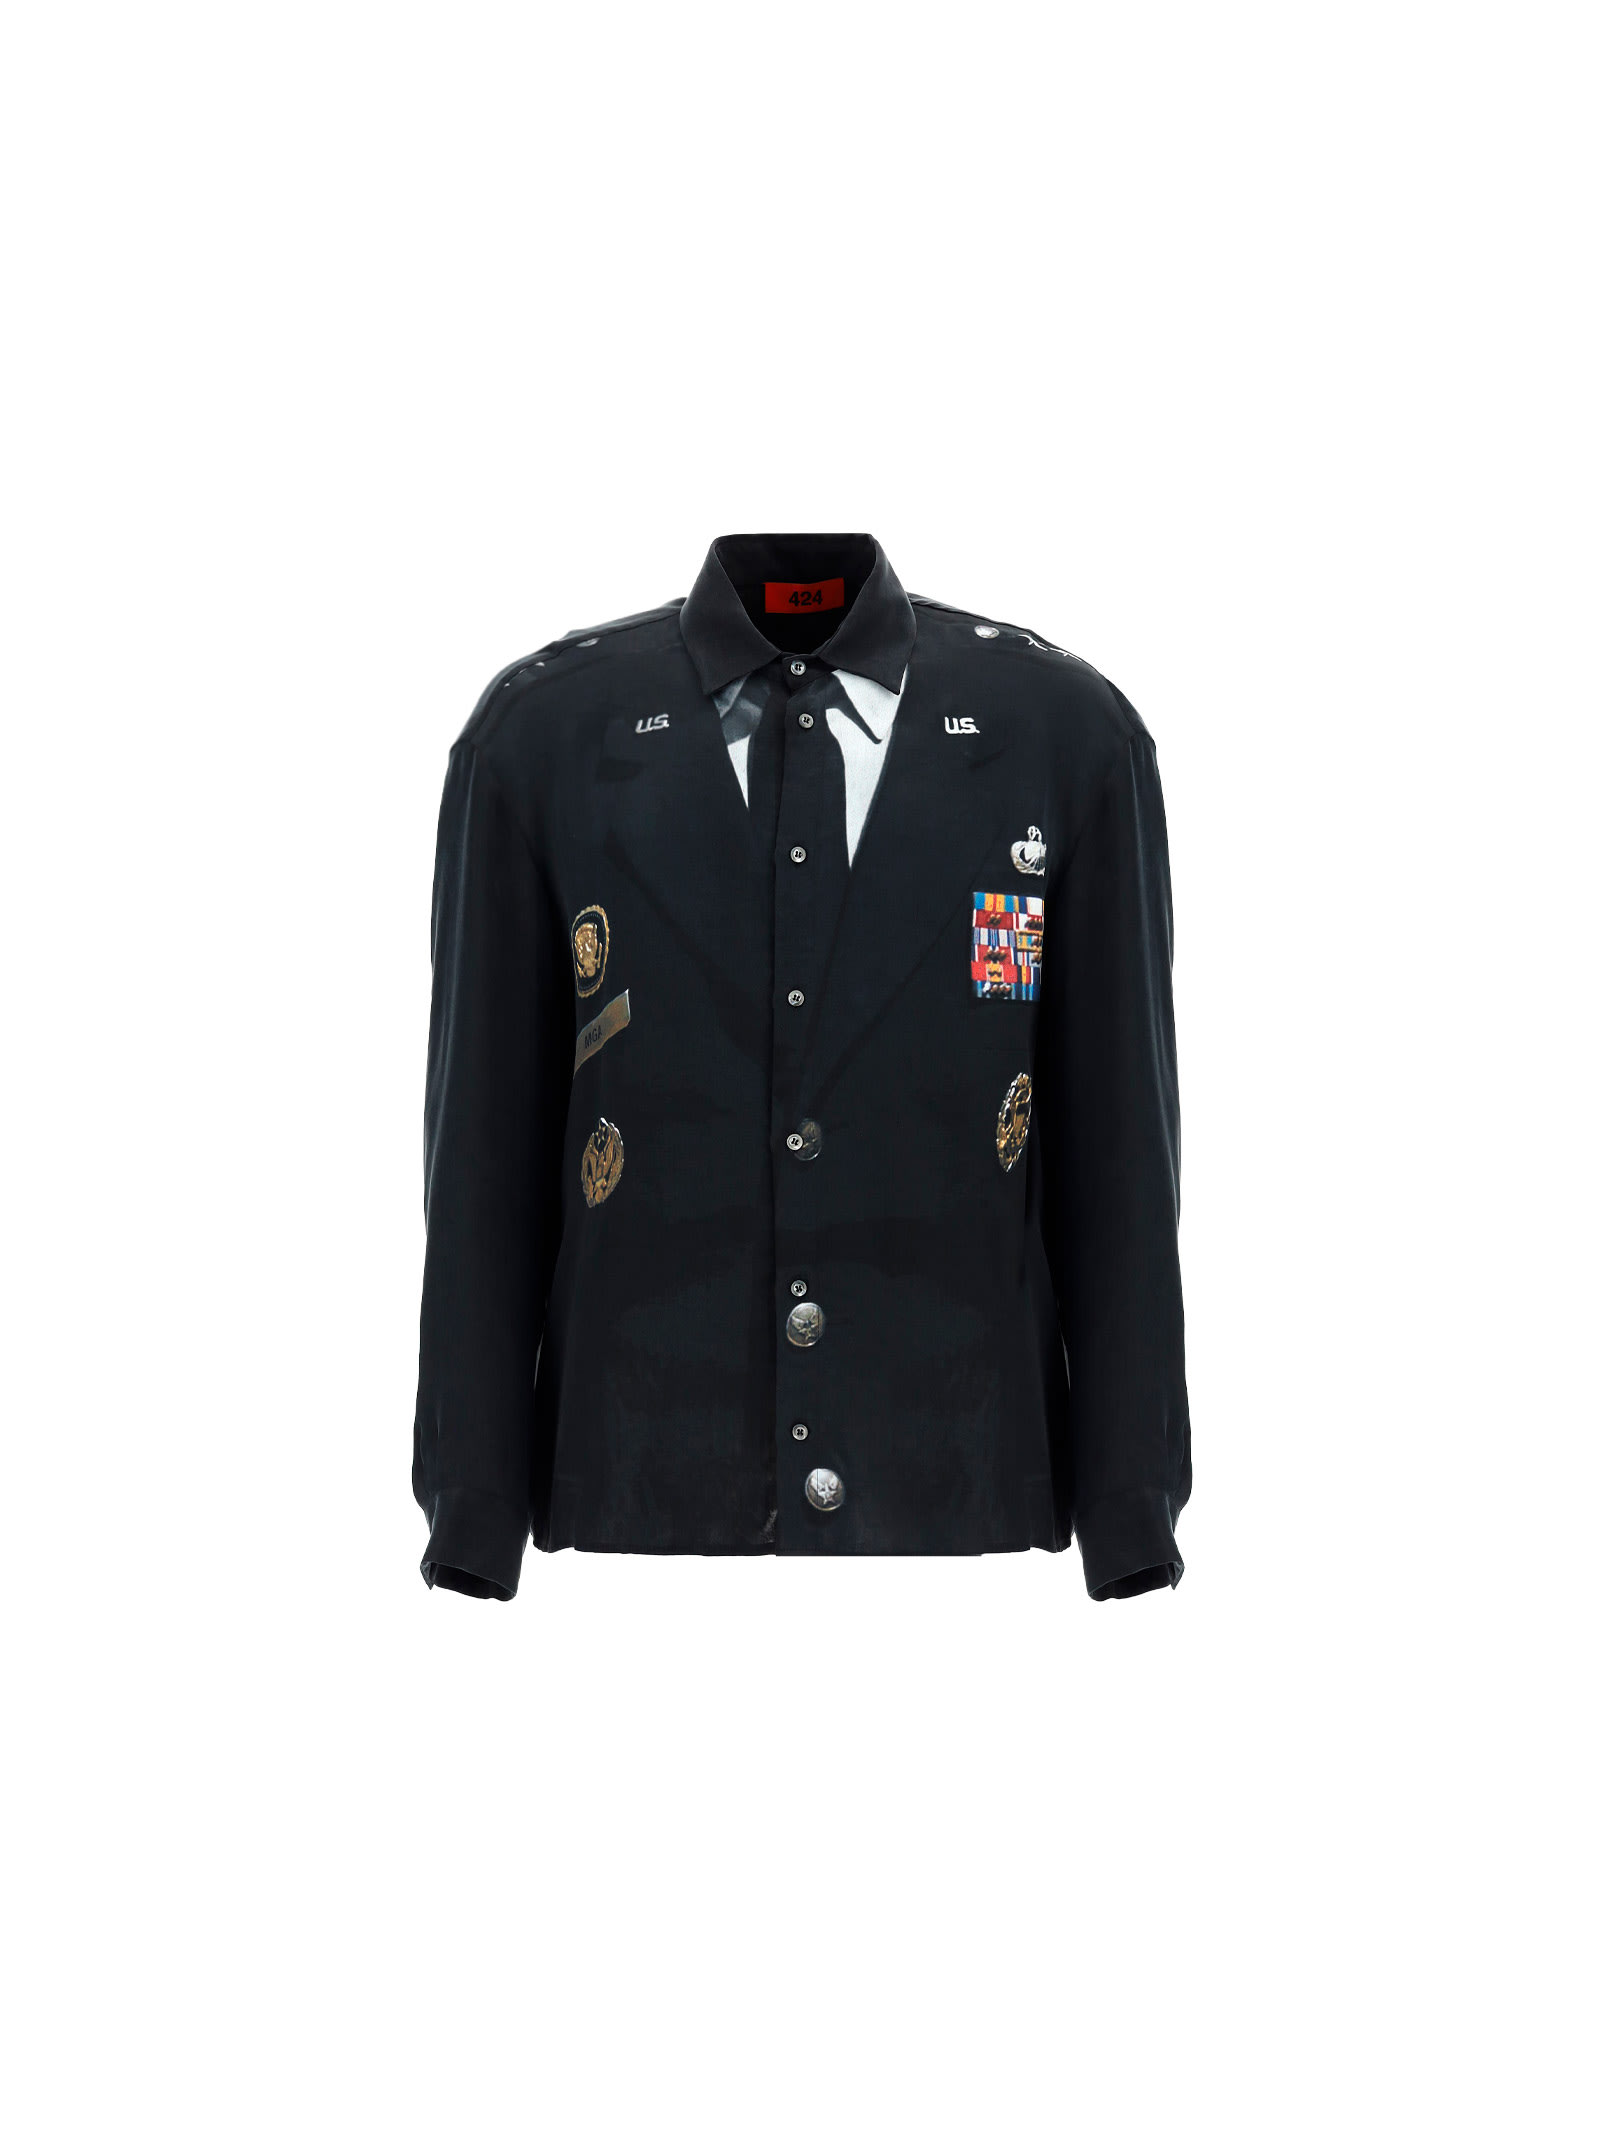 424 Shirt